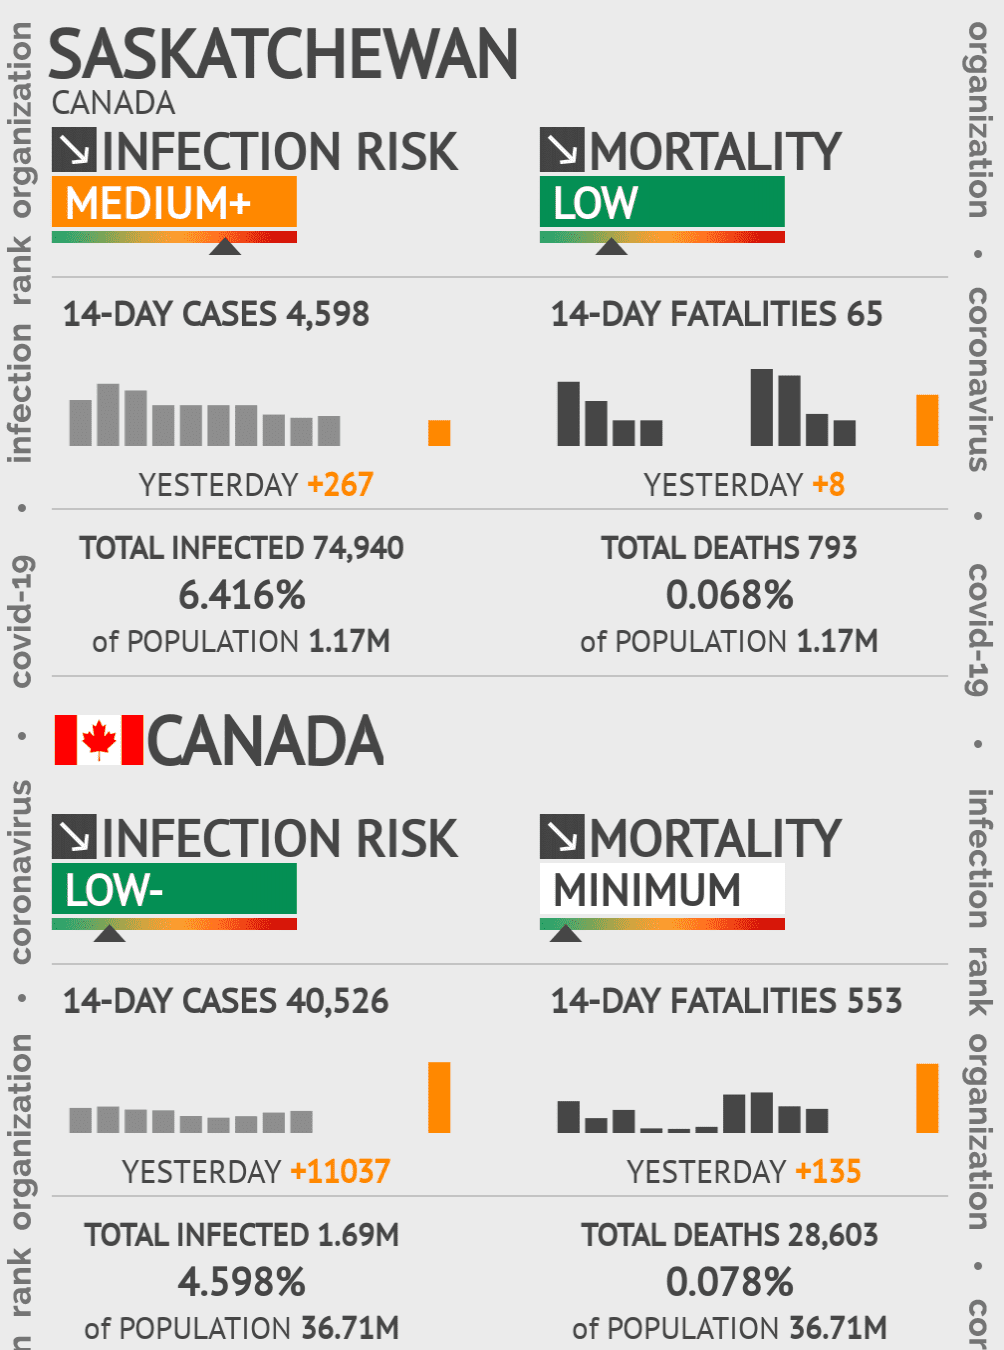 Saskatchewan Coronavirus Covid-19 Risk of Infection on February 28, 2021